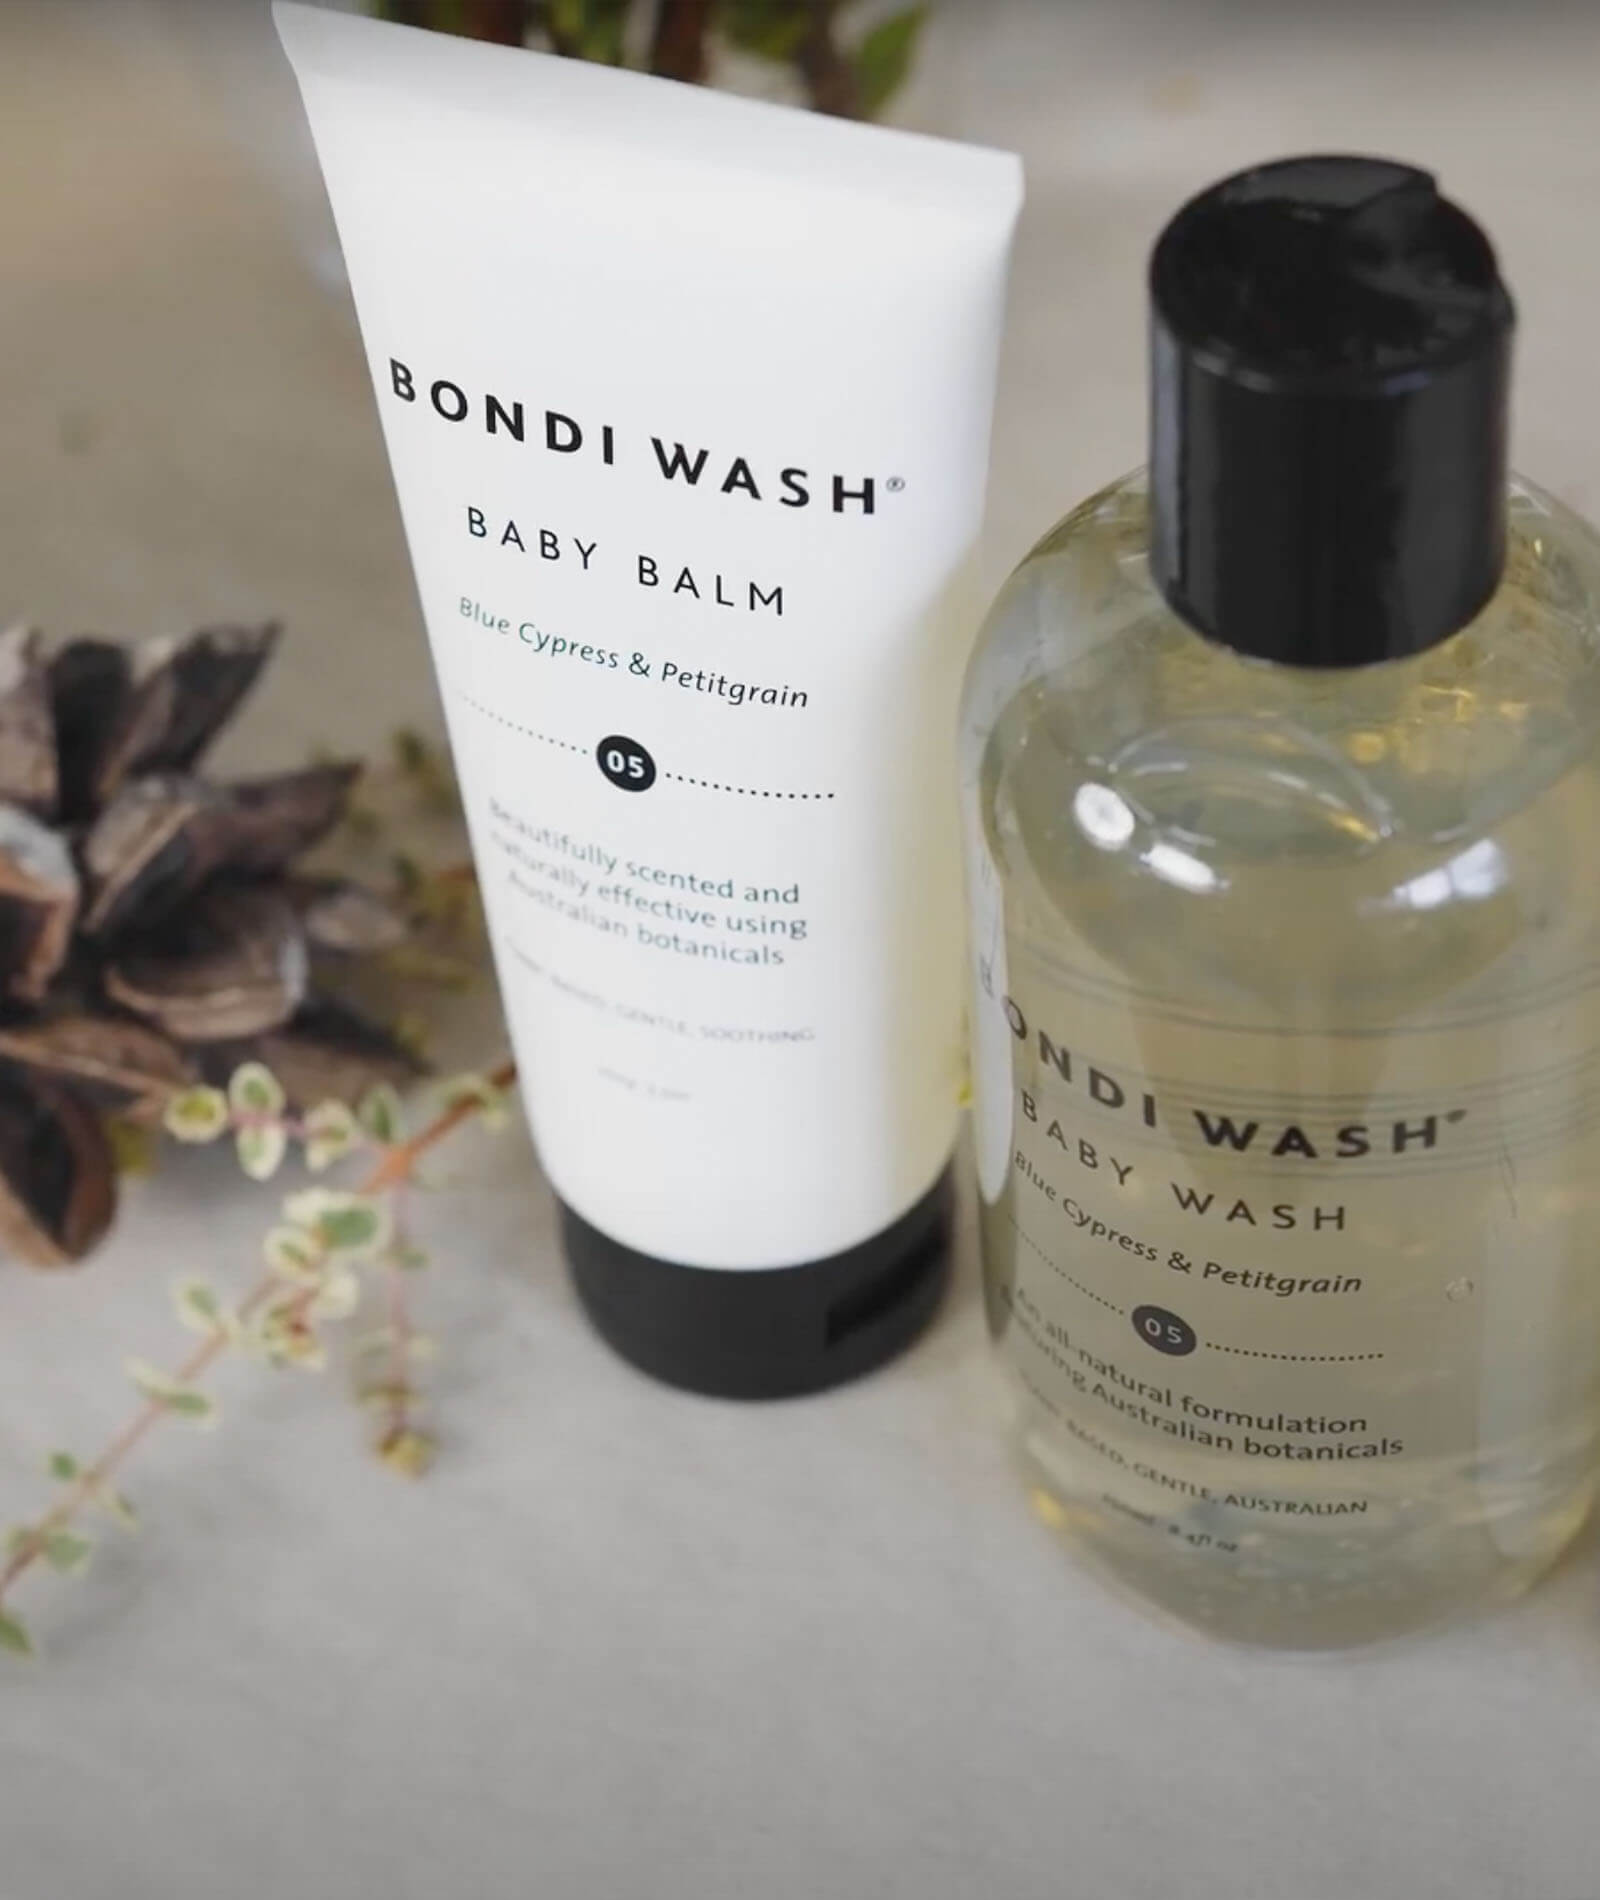 TWENTYTWONOTES Bondi Wash_Baby Balm Blue Cypress & Petitgrain range